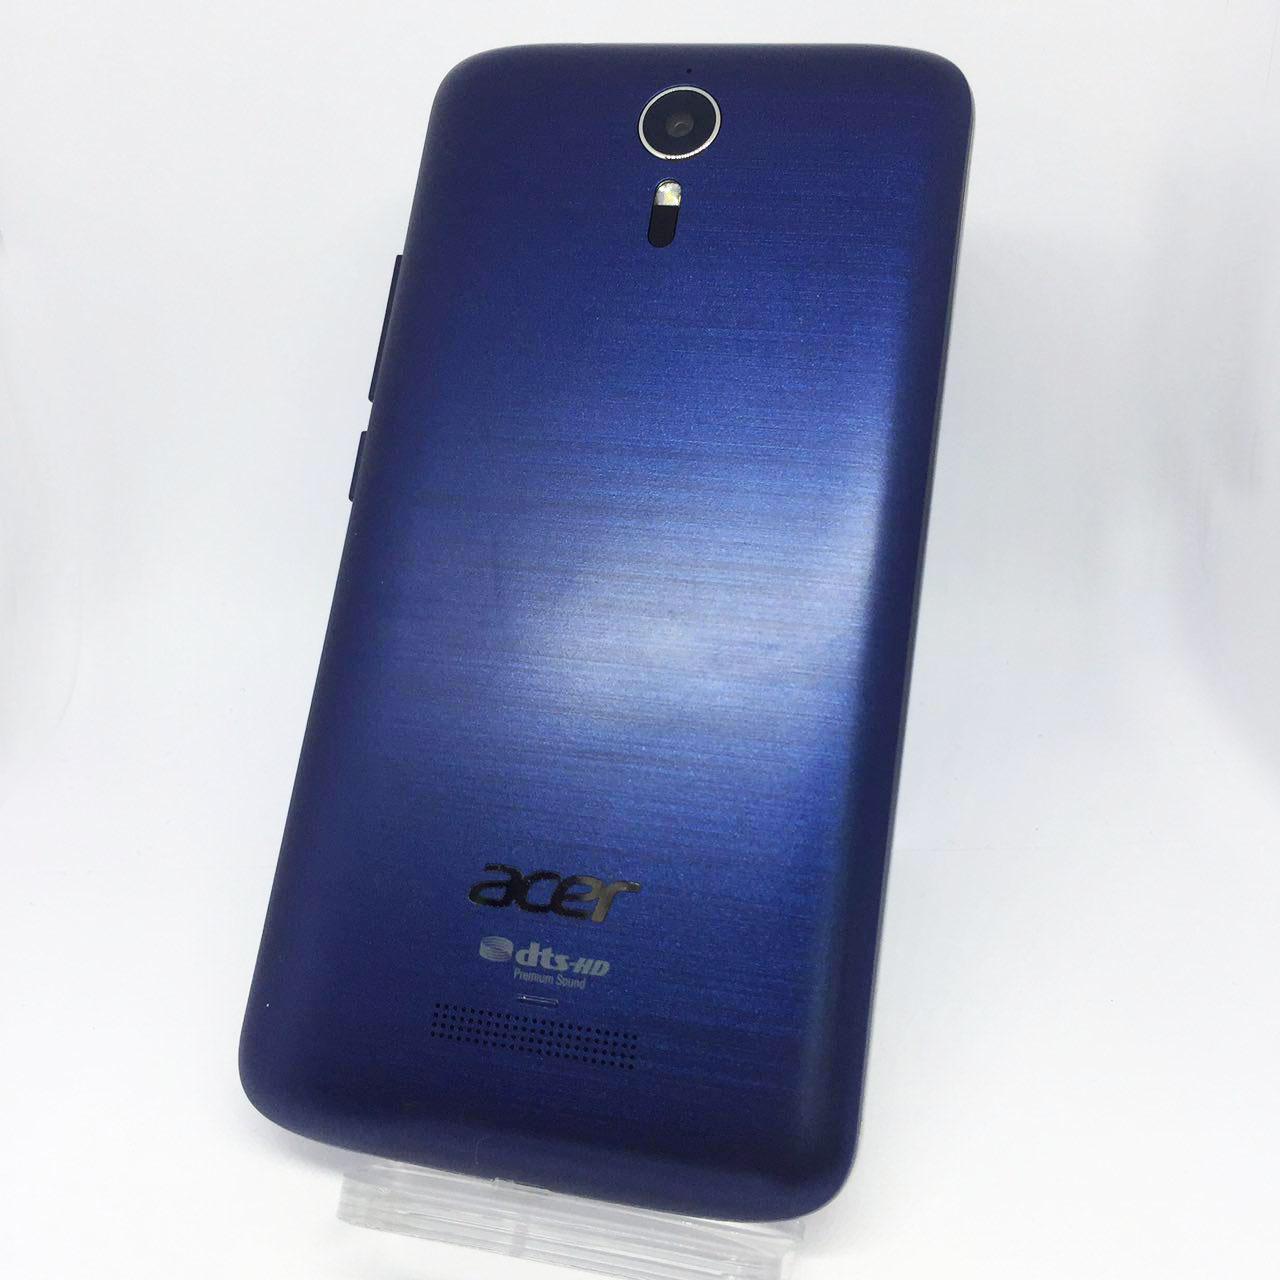 【創宇通訊】ACER liquid zest plus 16G 藍色【福利機】